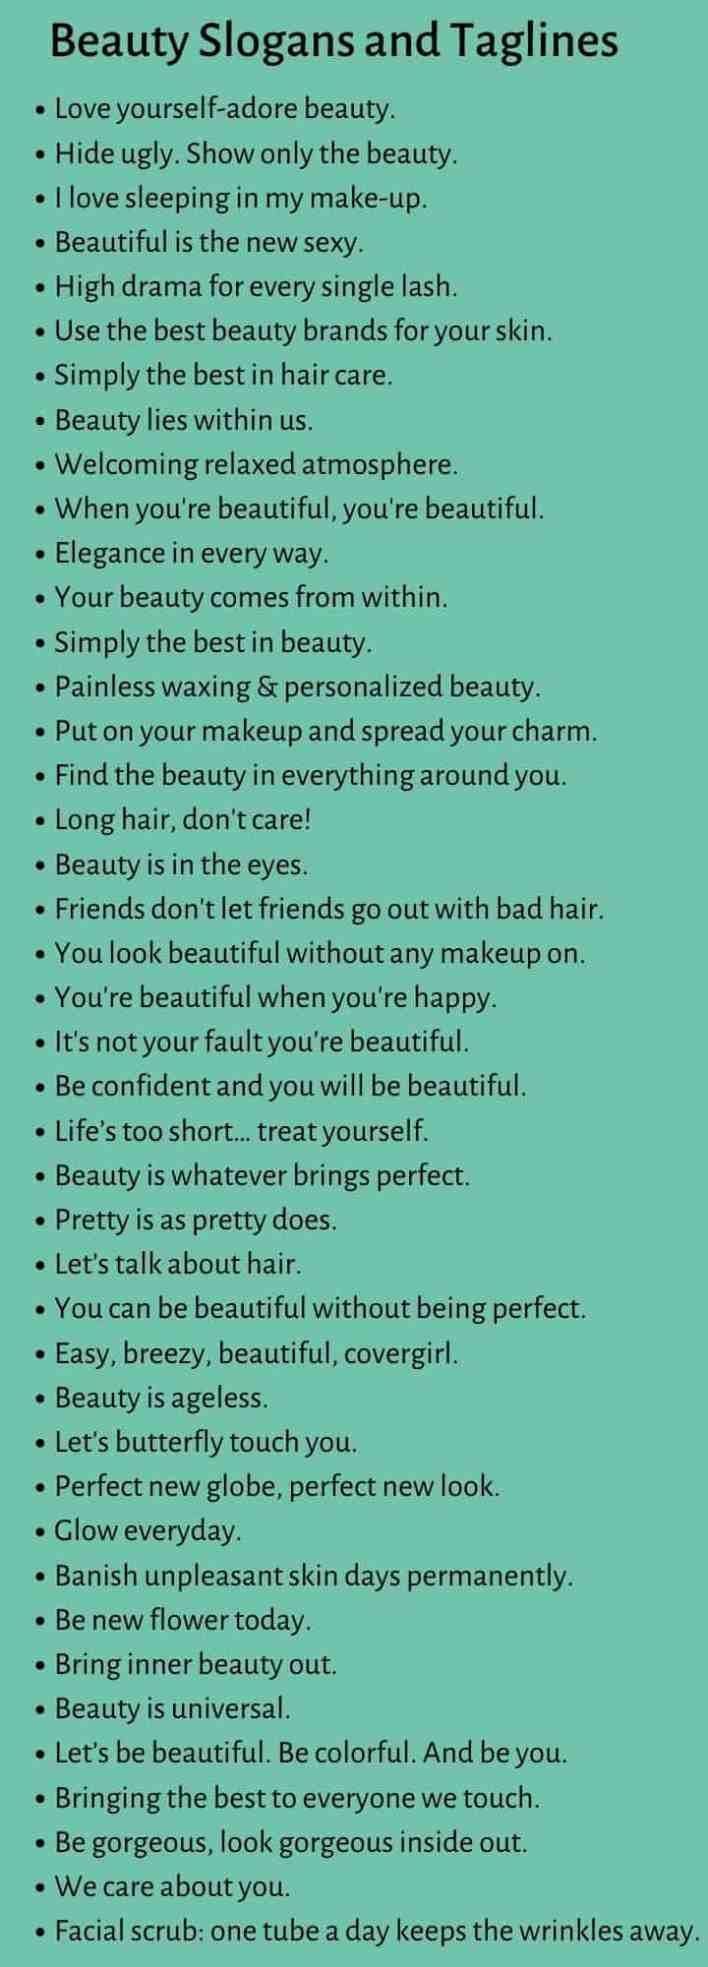 Beauty Slogans